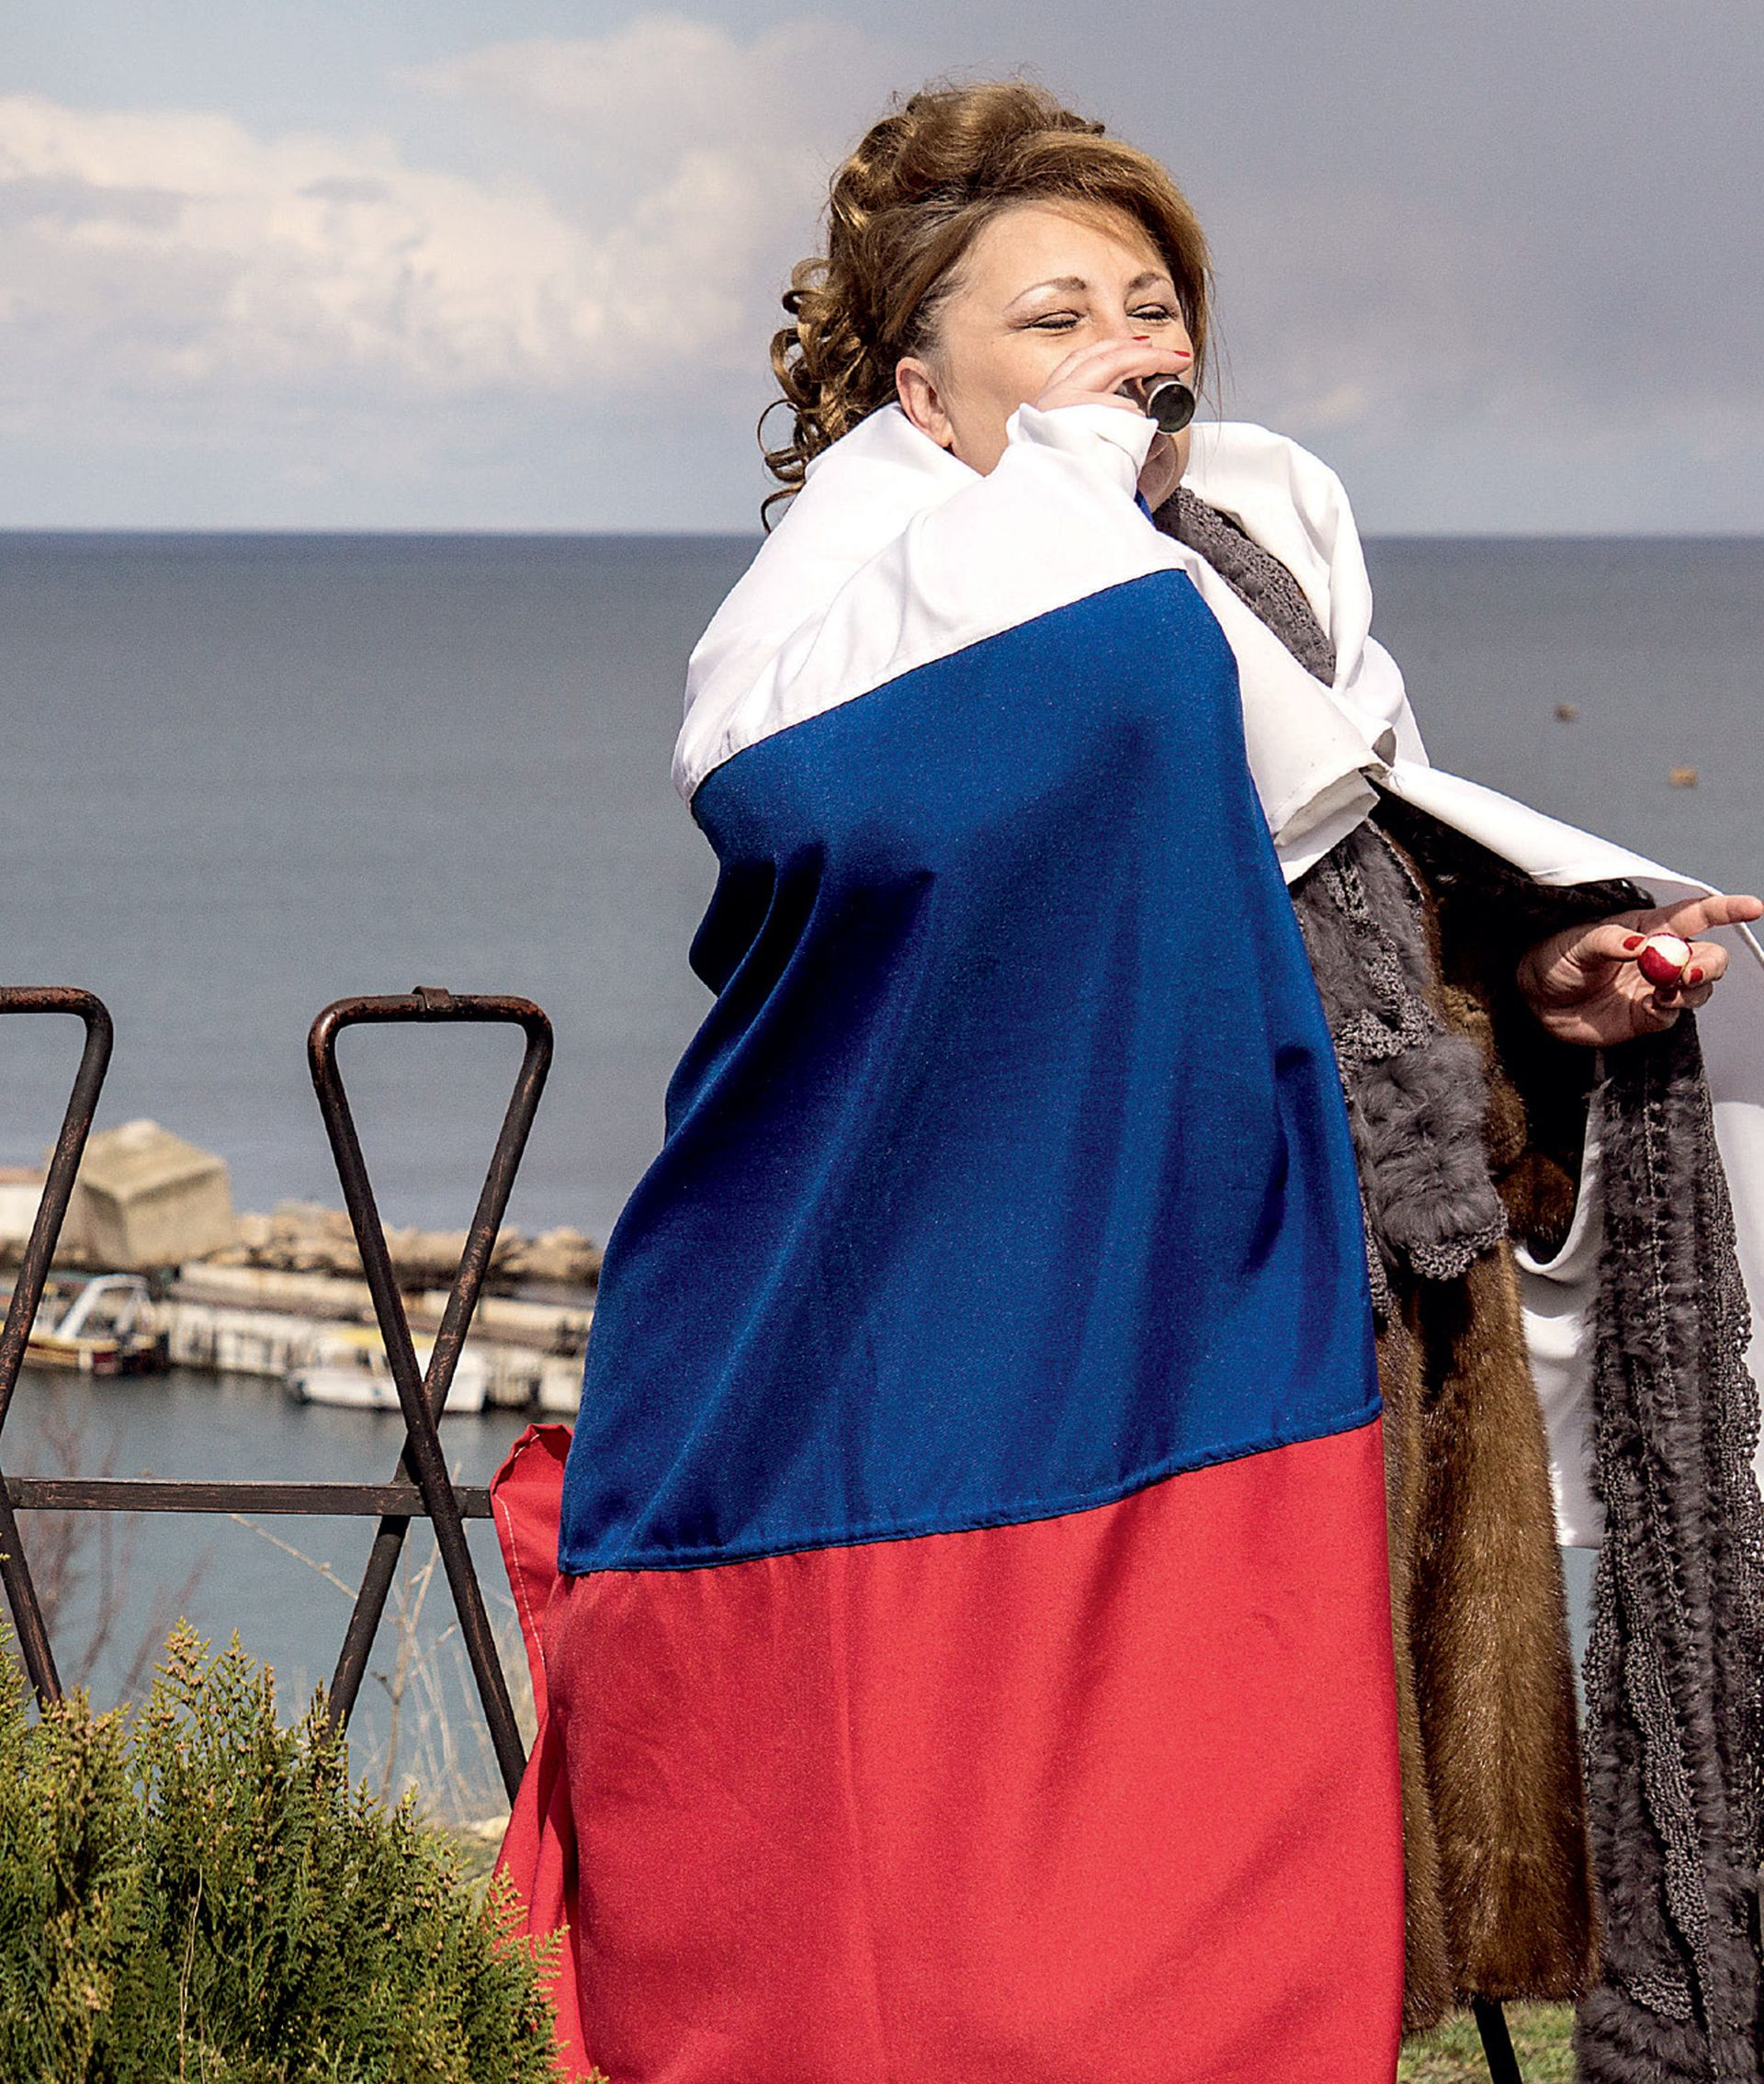 FELJTON Crno more: opasna europska zona sraza Rusije i Zapada